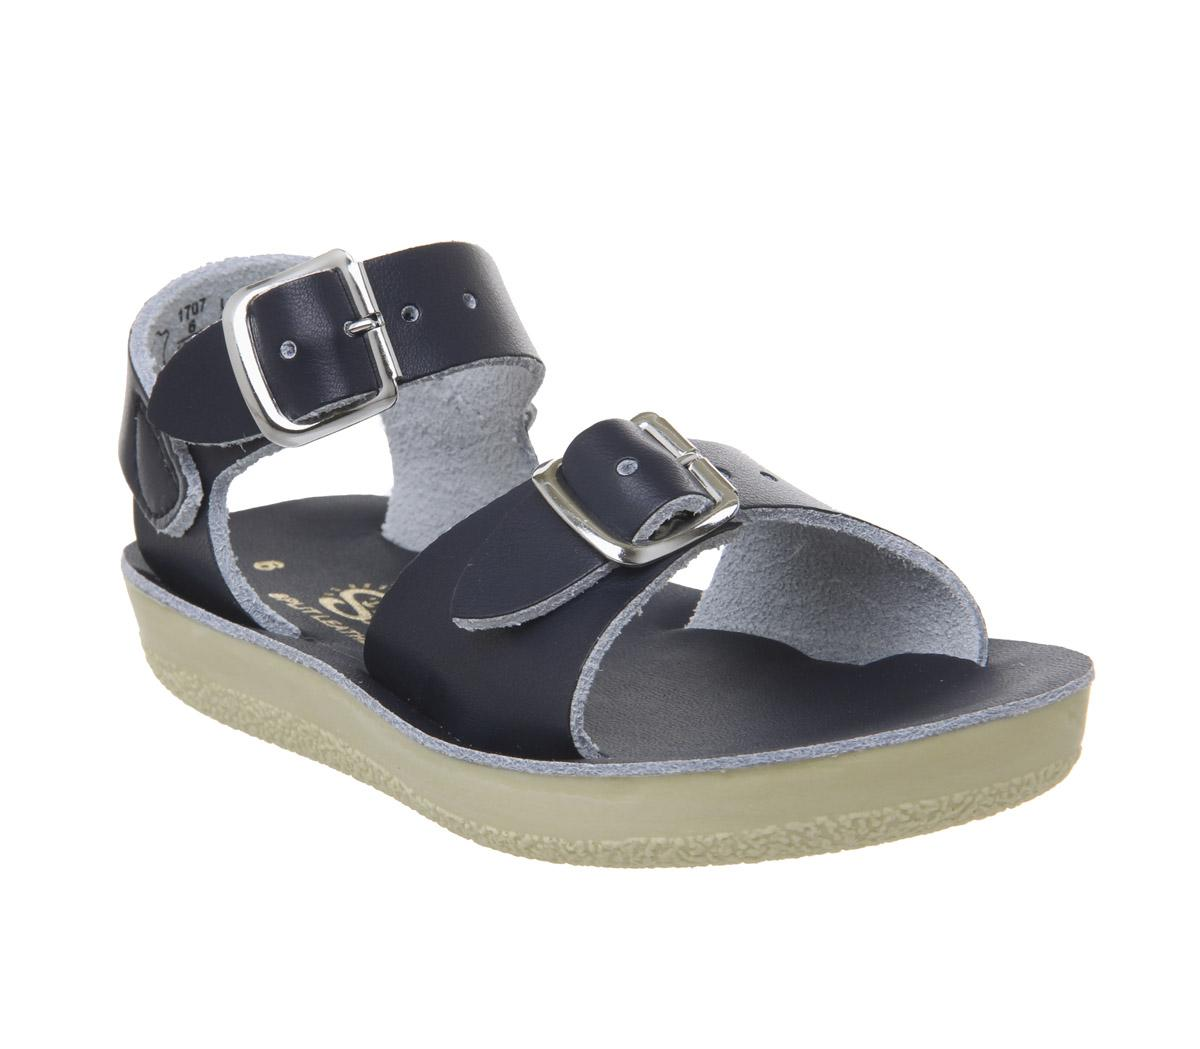 Surfer 4-7 Sandals